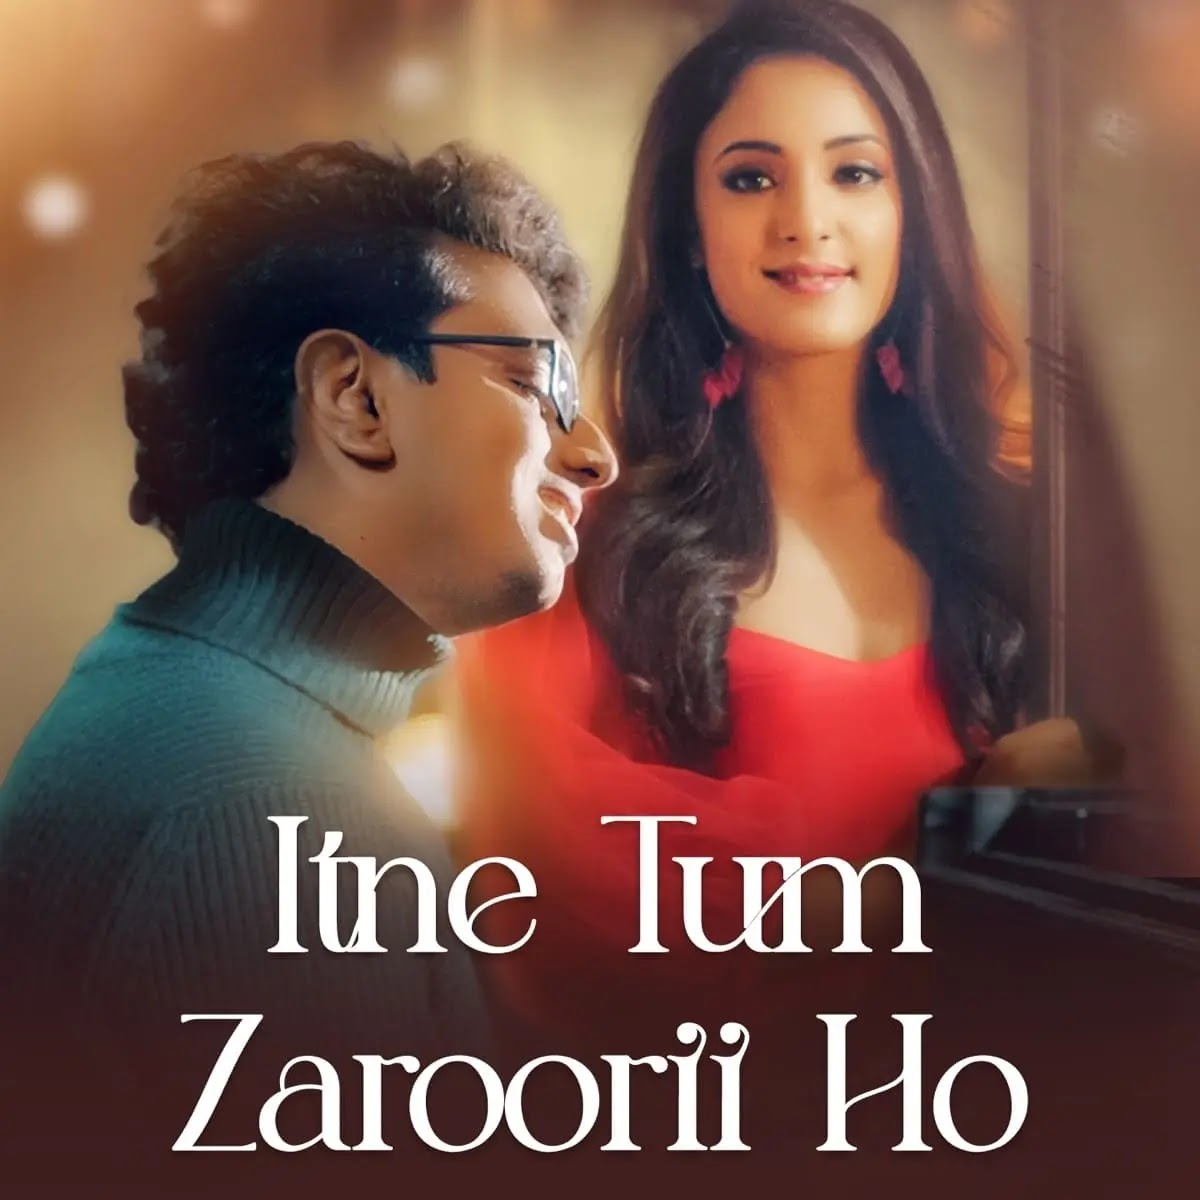 Itne Tum Zarooii Ho Mp3 Song Download 320kbps Free